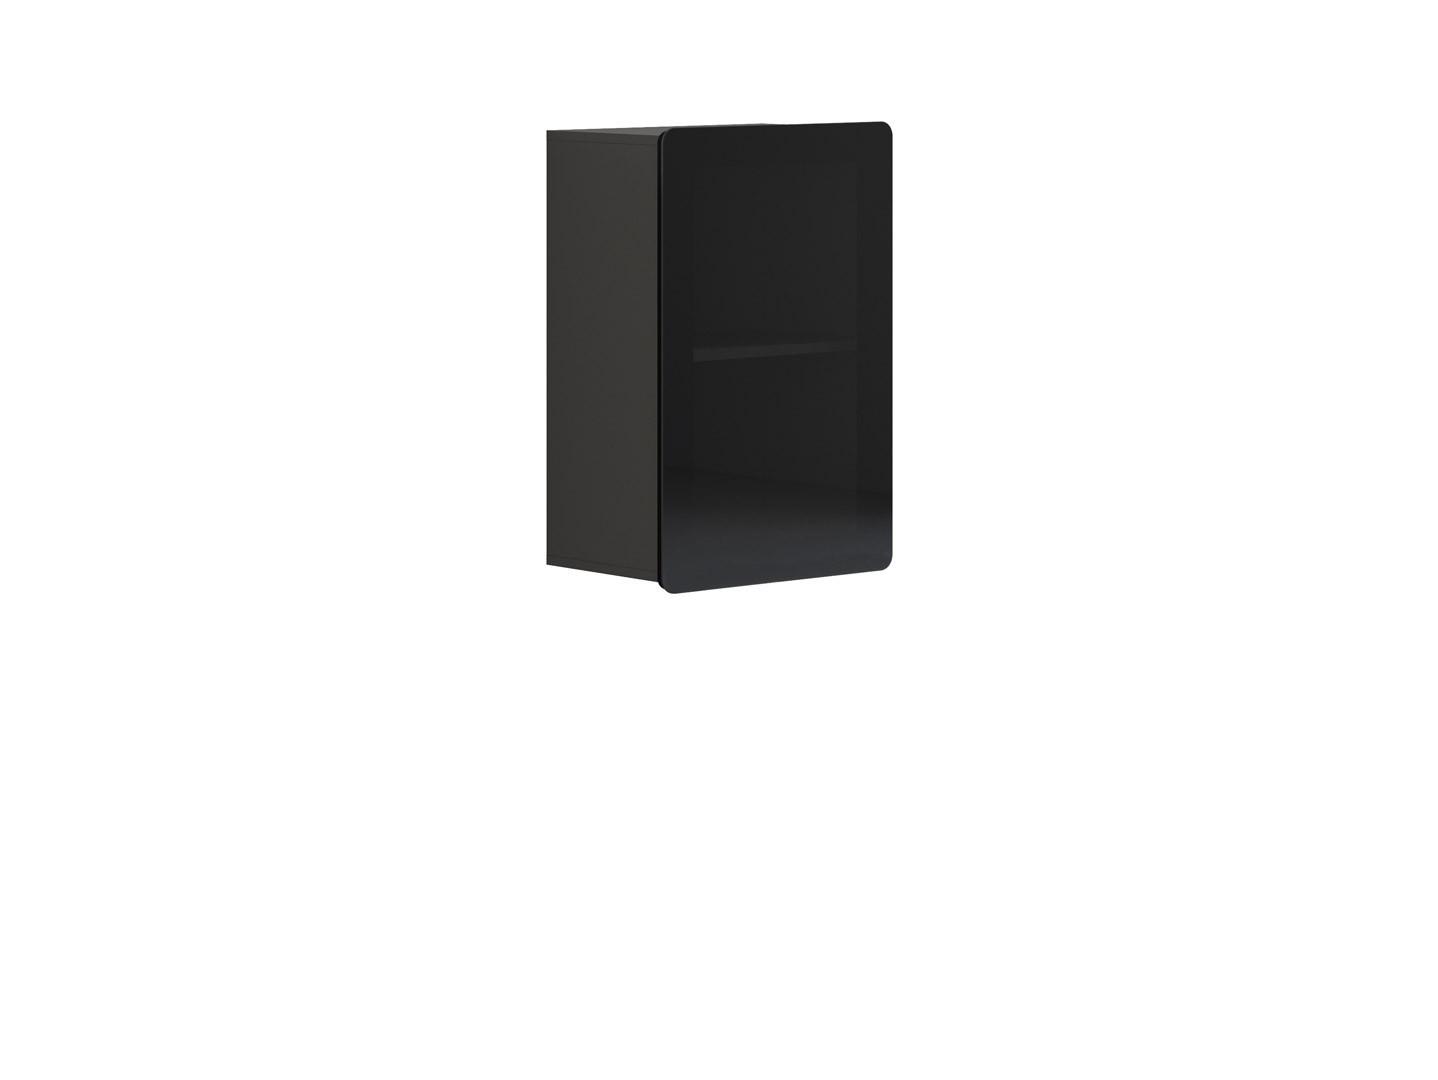 Vitrína na zeď - BRW - Possi Light - SFW1W/8/5 (šedý wolfram) (s osvětlením)